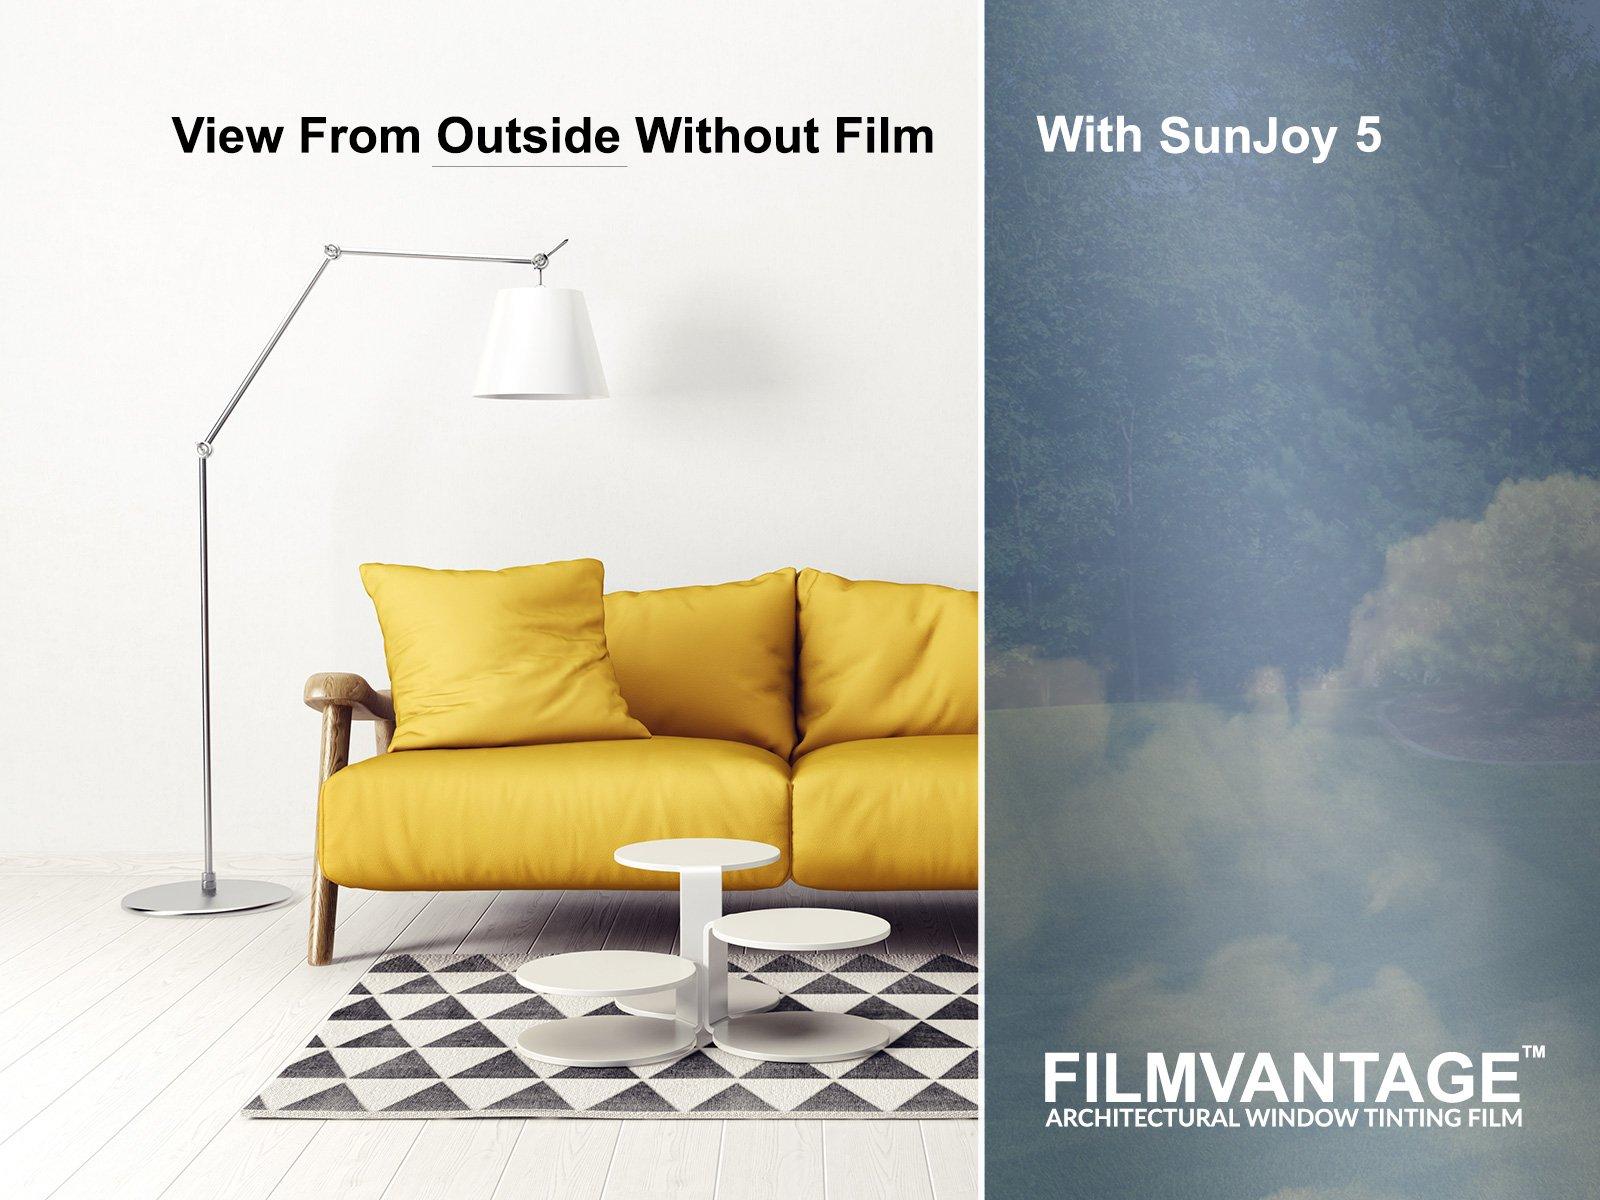 SunJoy 5 One Way Mirror Privacy Home Commercial Window Tint Film Solar UV Heat Control - 48 Inch By 10 Feet